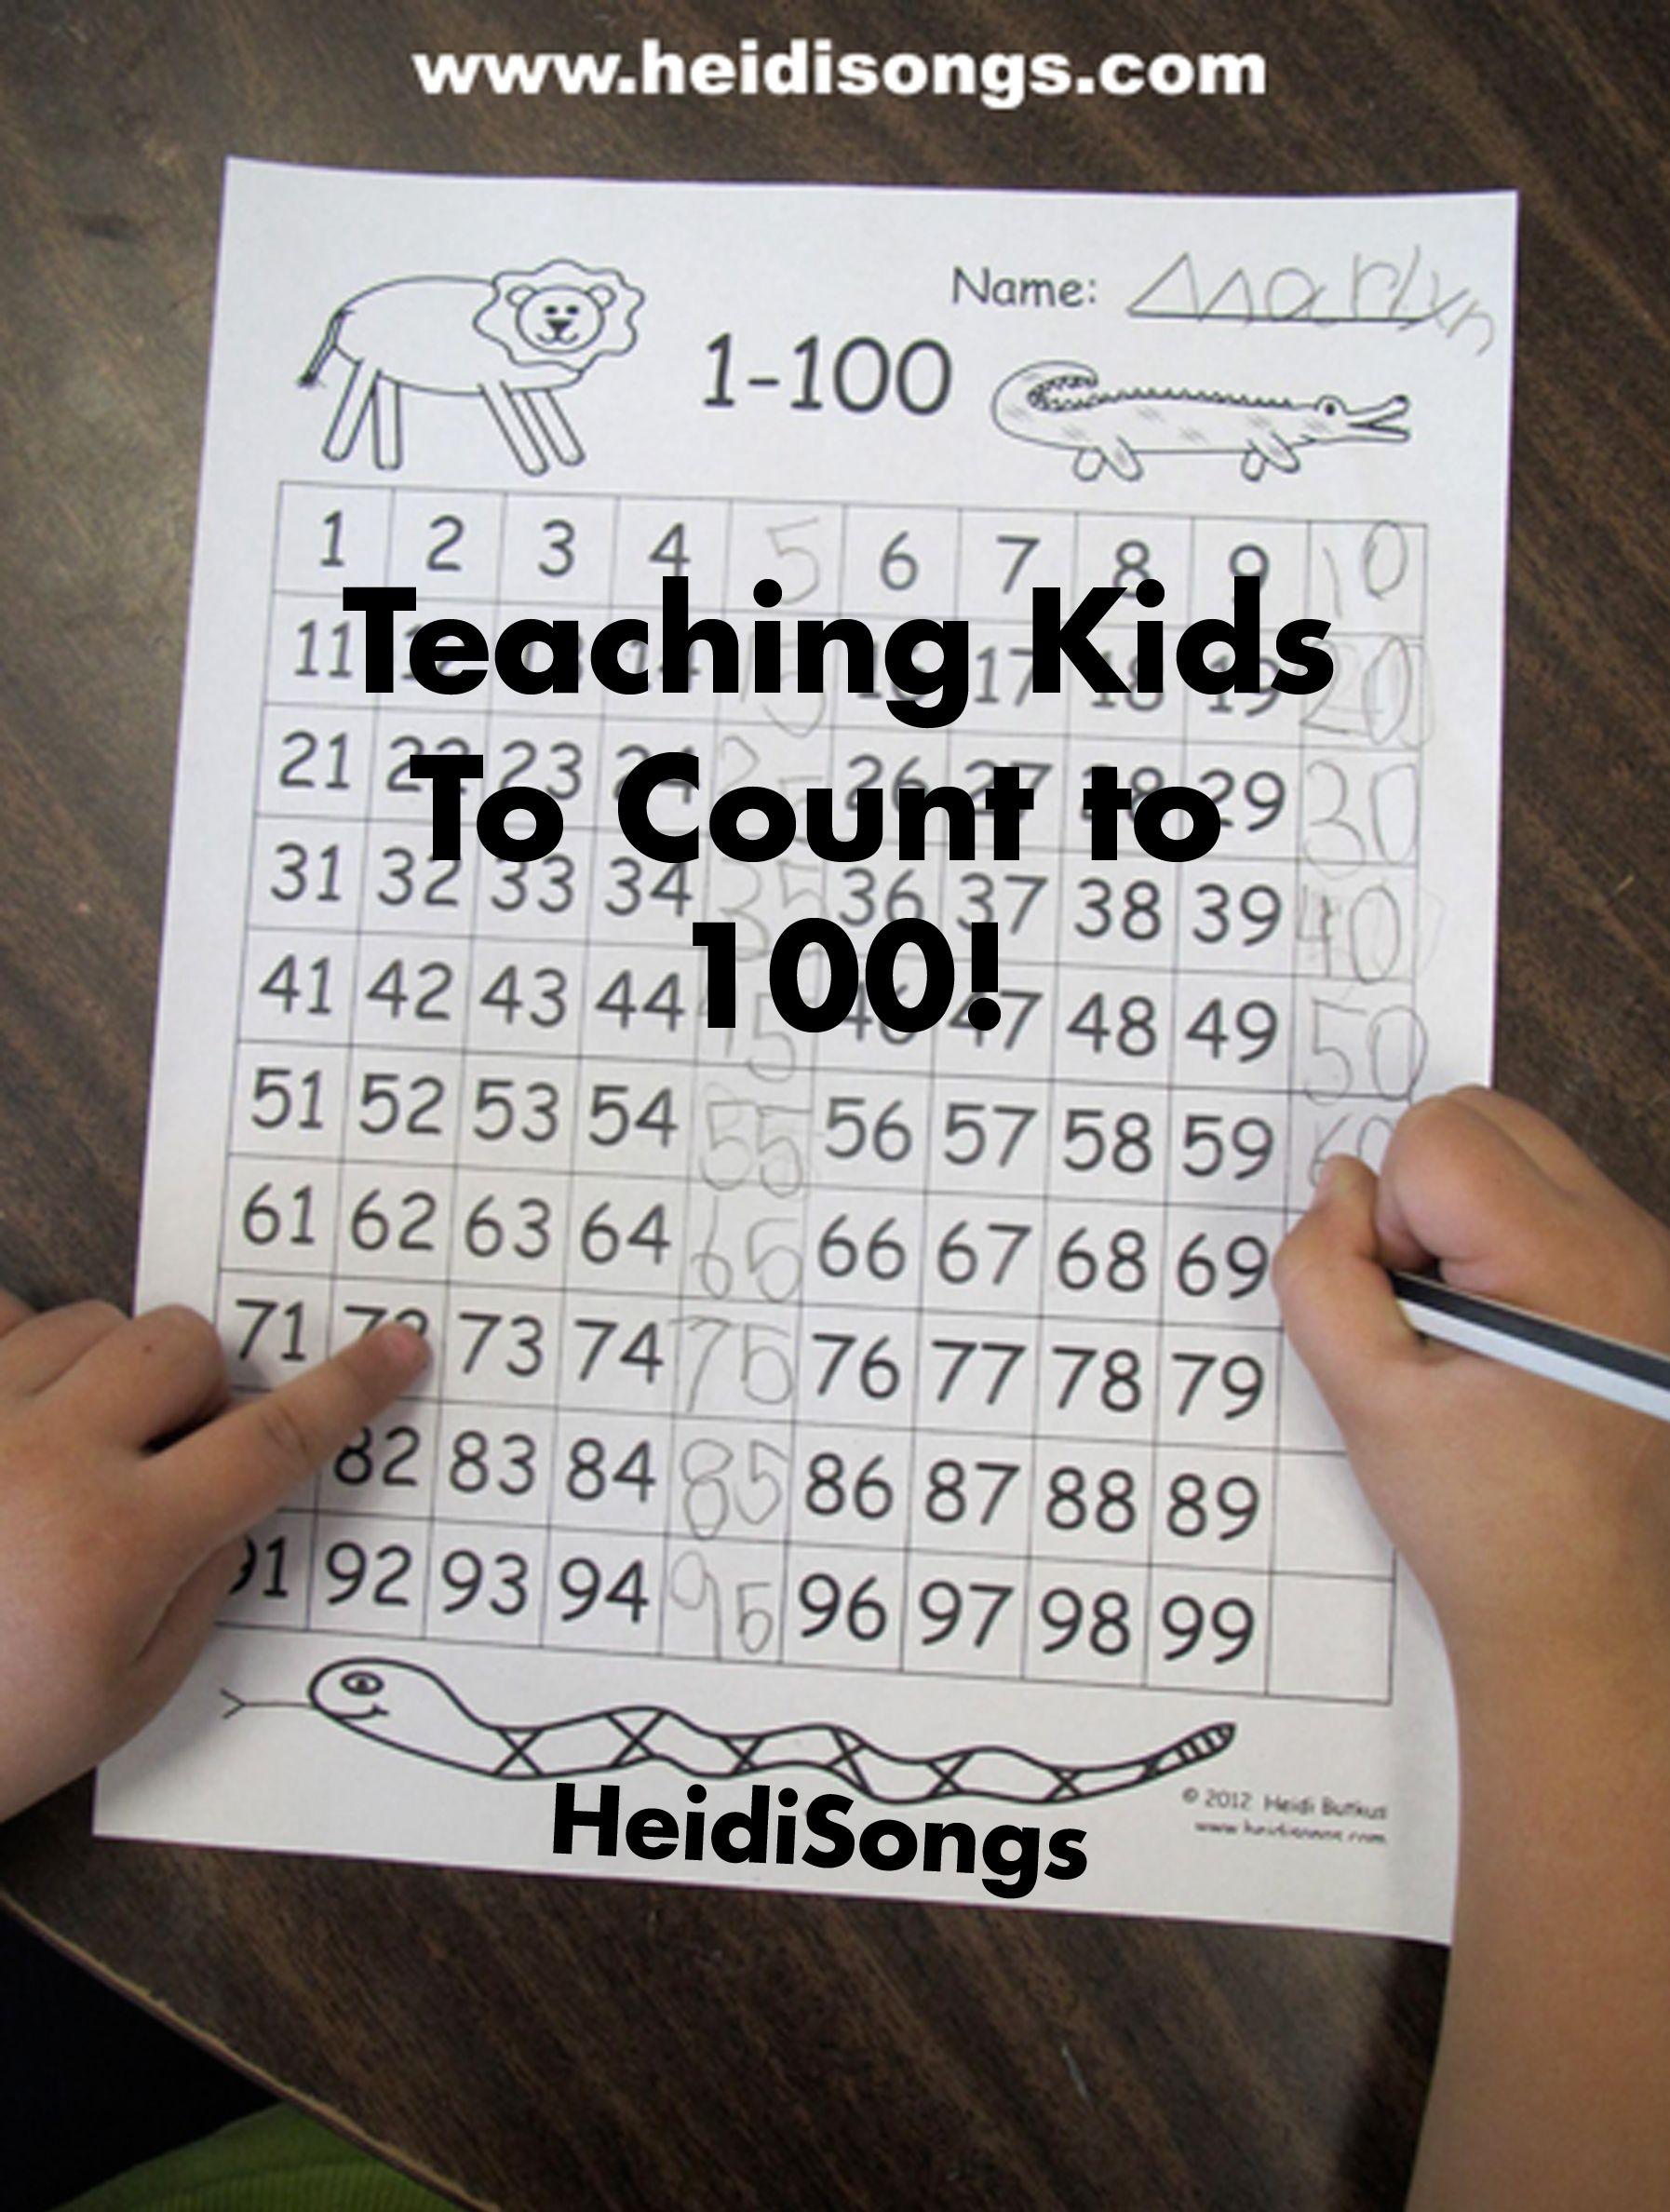 10 fun ways of helping kids learn the abc's - teach mama